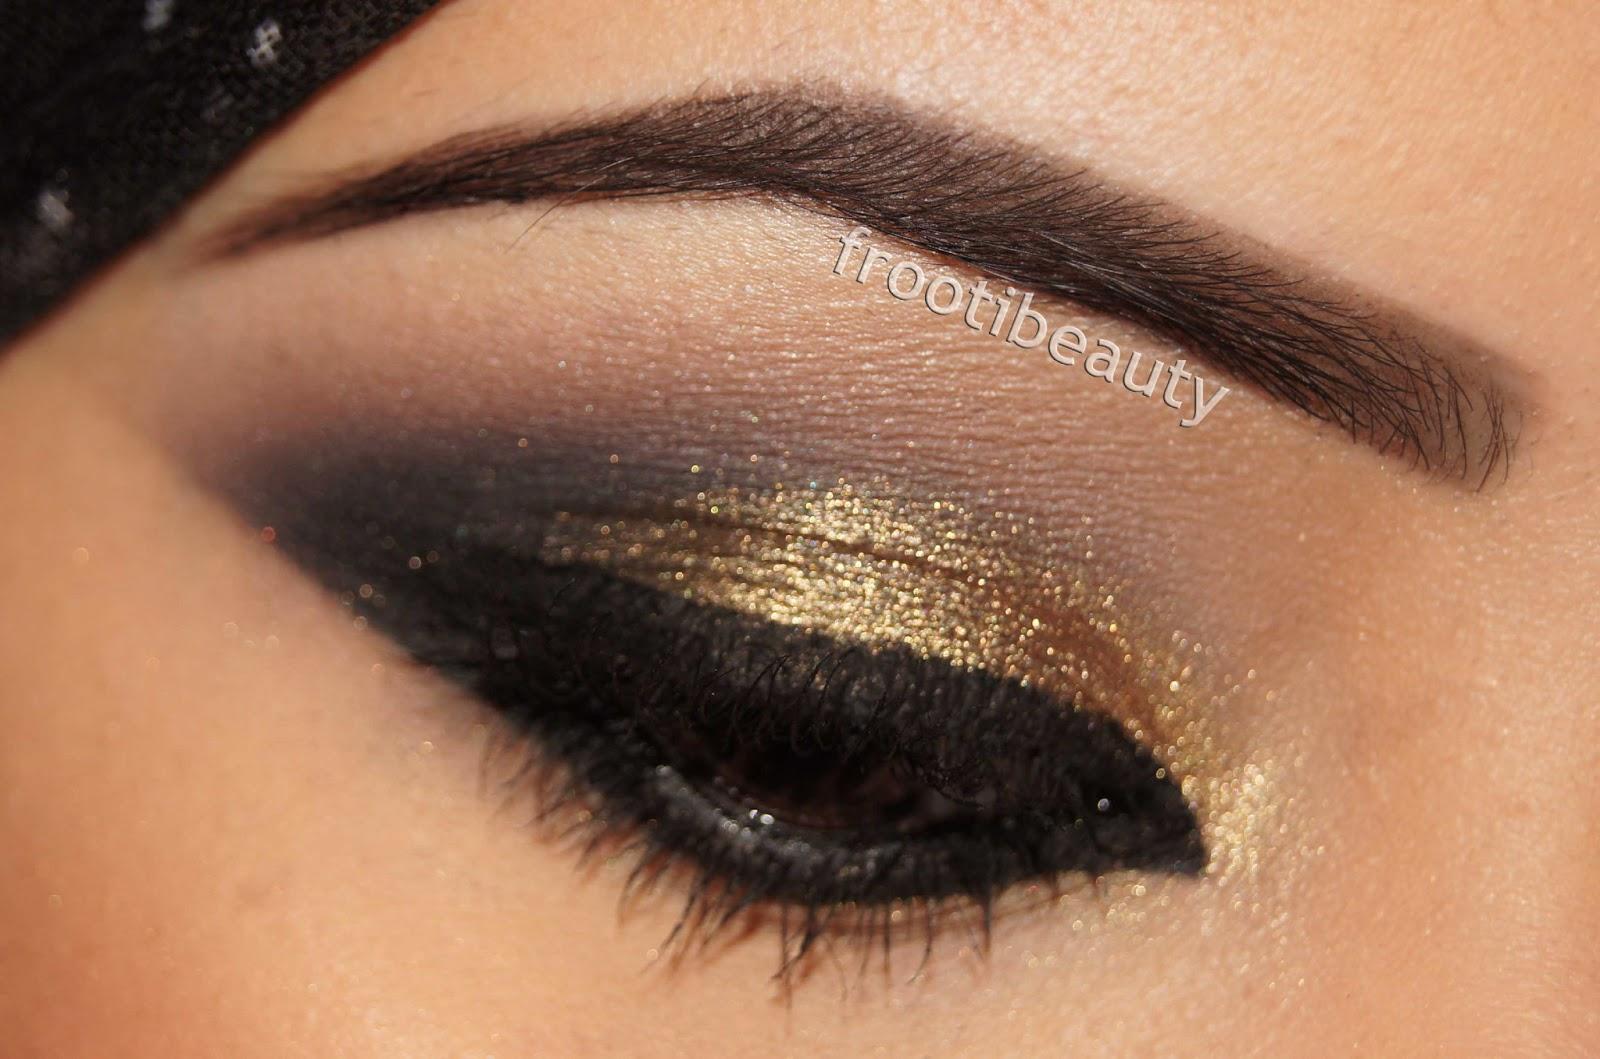 frootibeauty fff gold black arabic khaleeji style makeup look. Black Bedroom Furniture Sets. Home Design Ideas